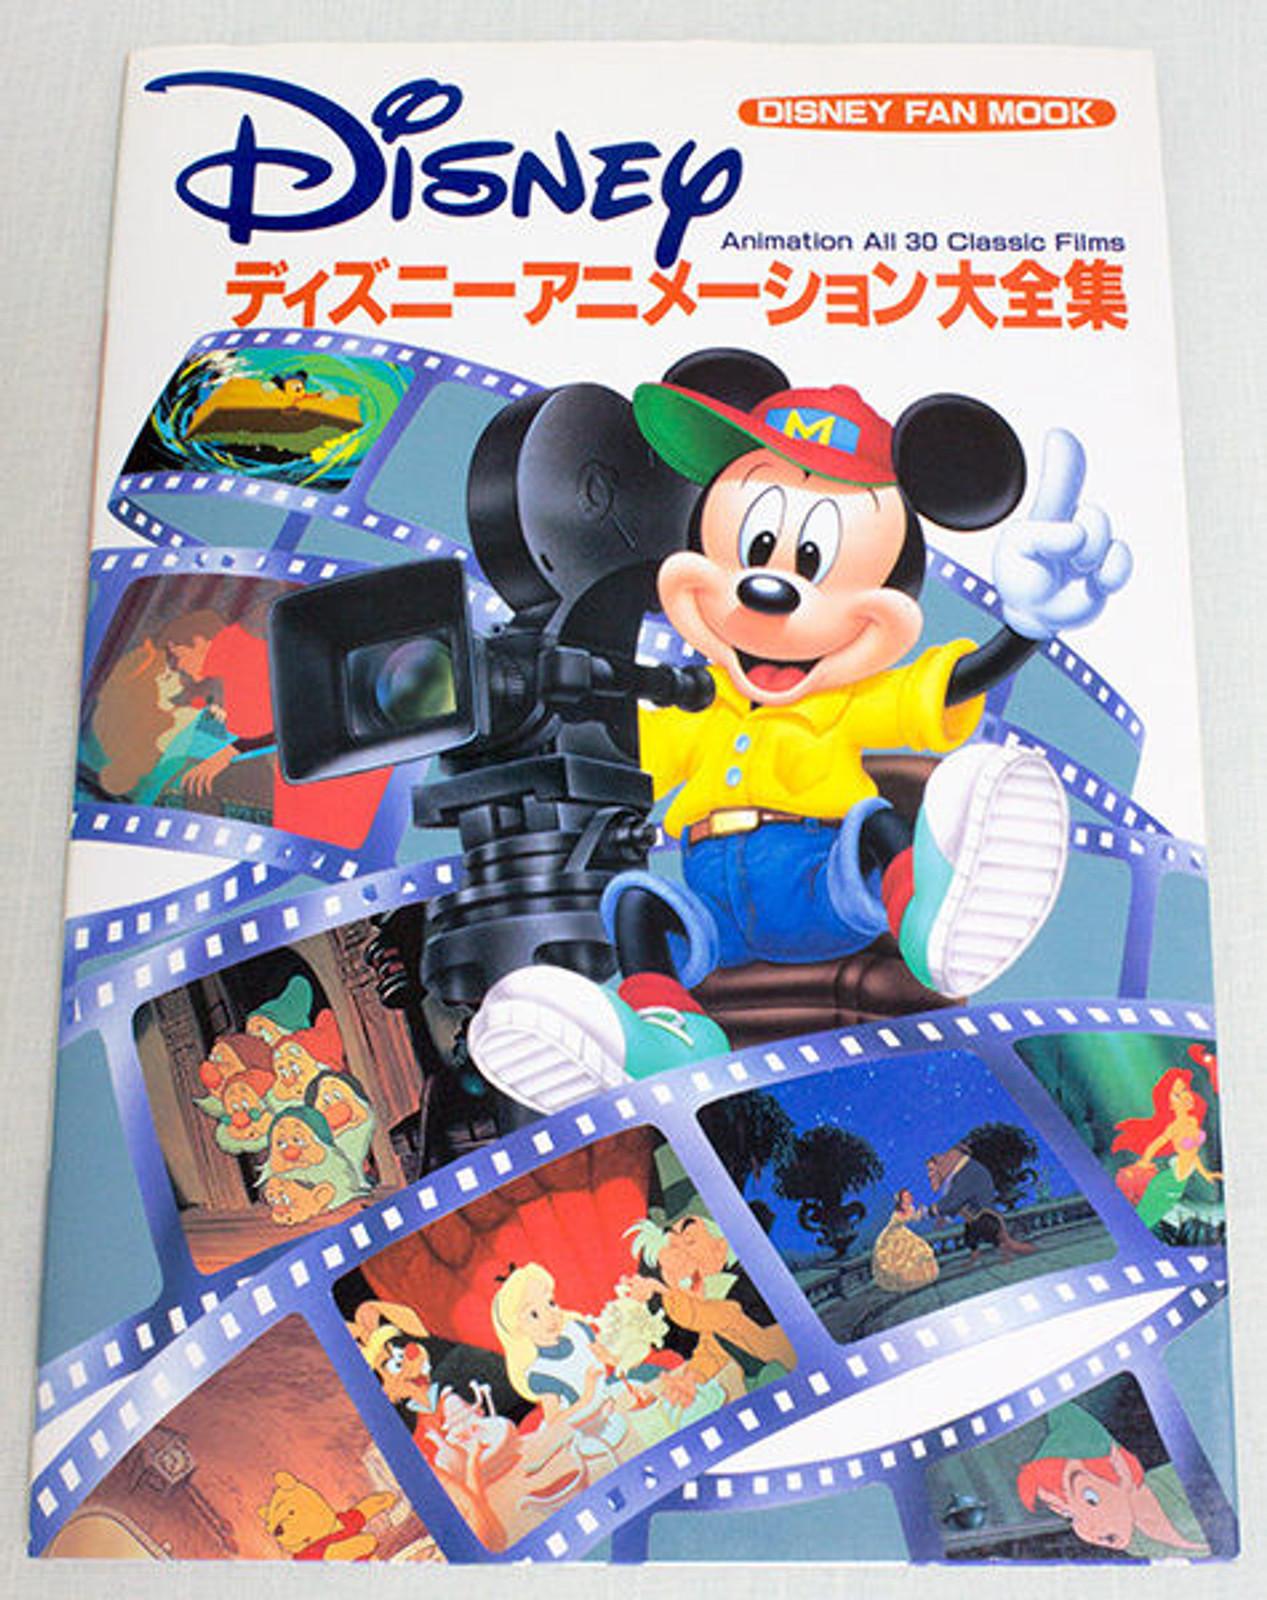 Disney Animation All 30 Classic Films Japanese Fan Book JAPAN ANIME MICKEY ALICE